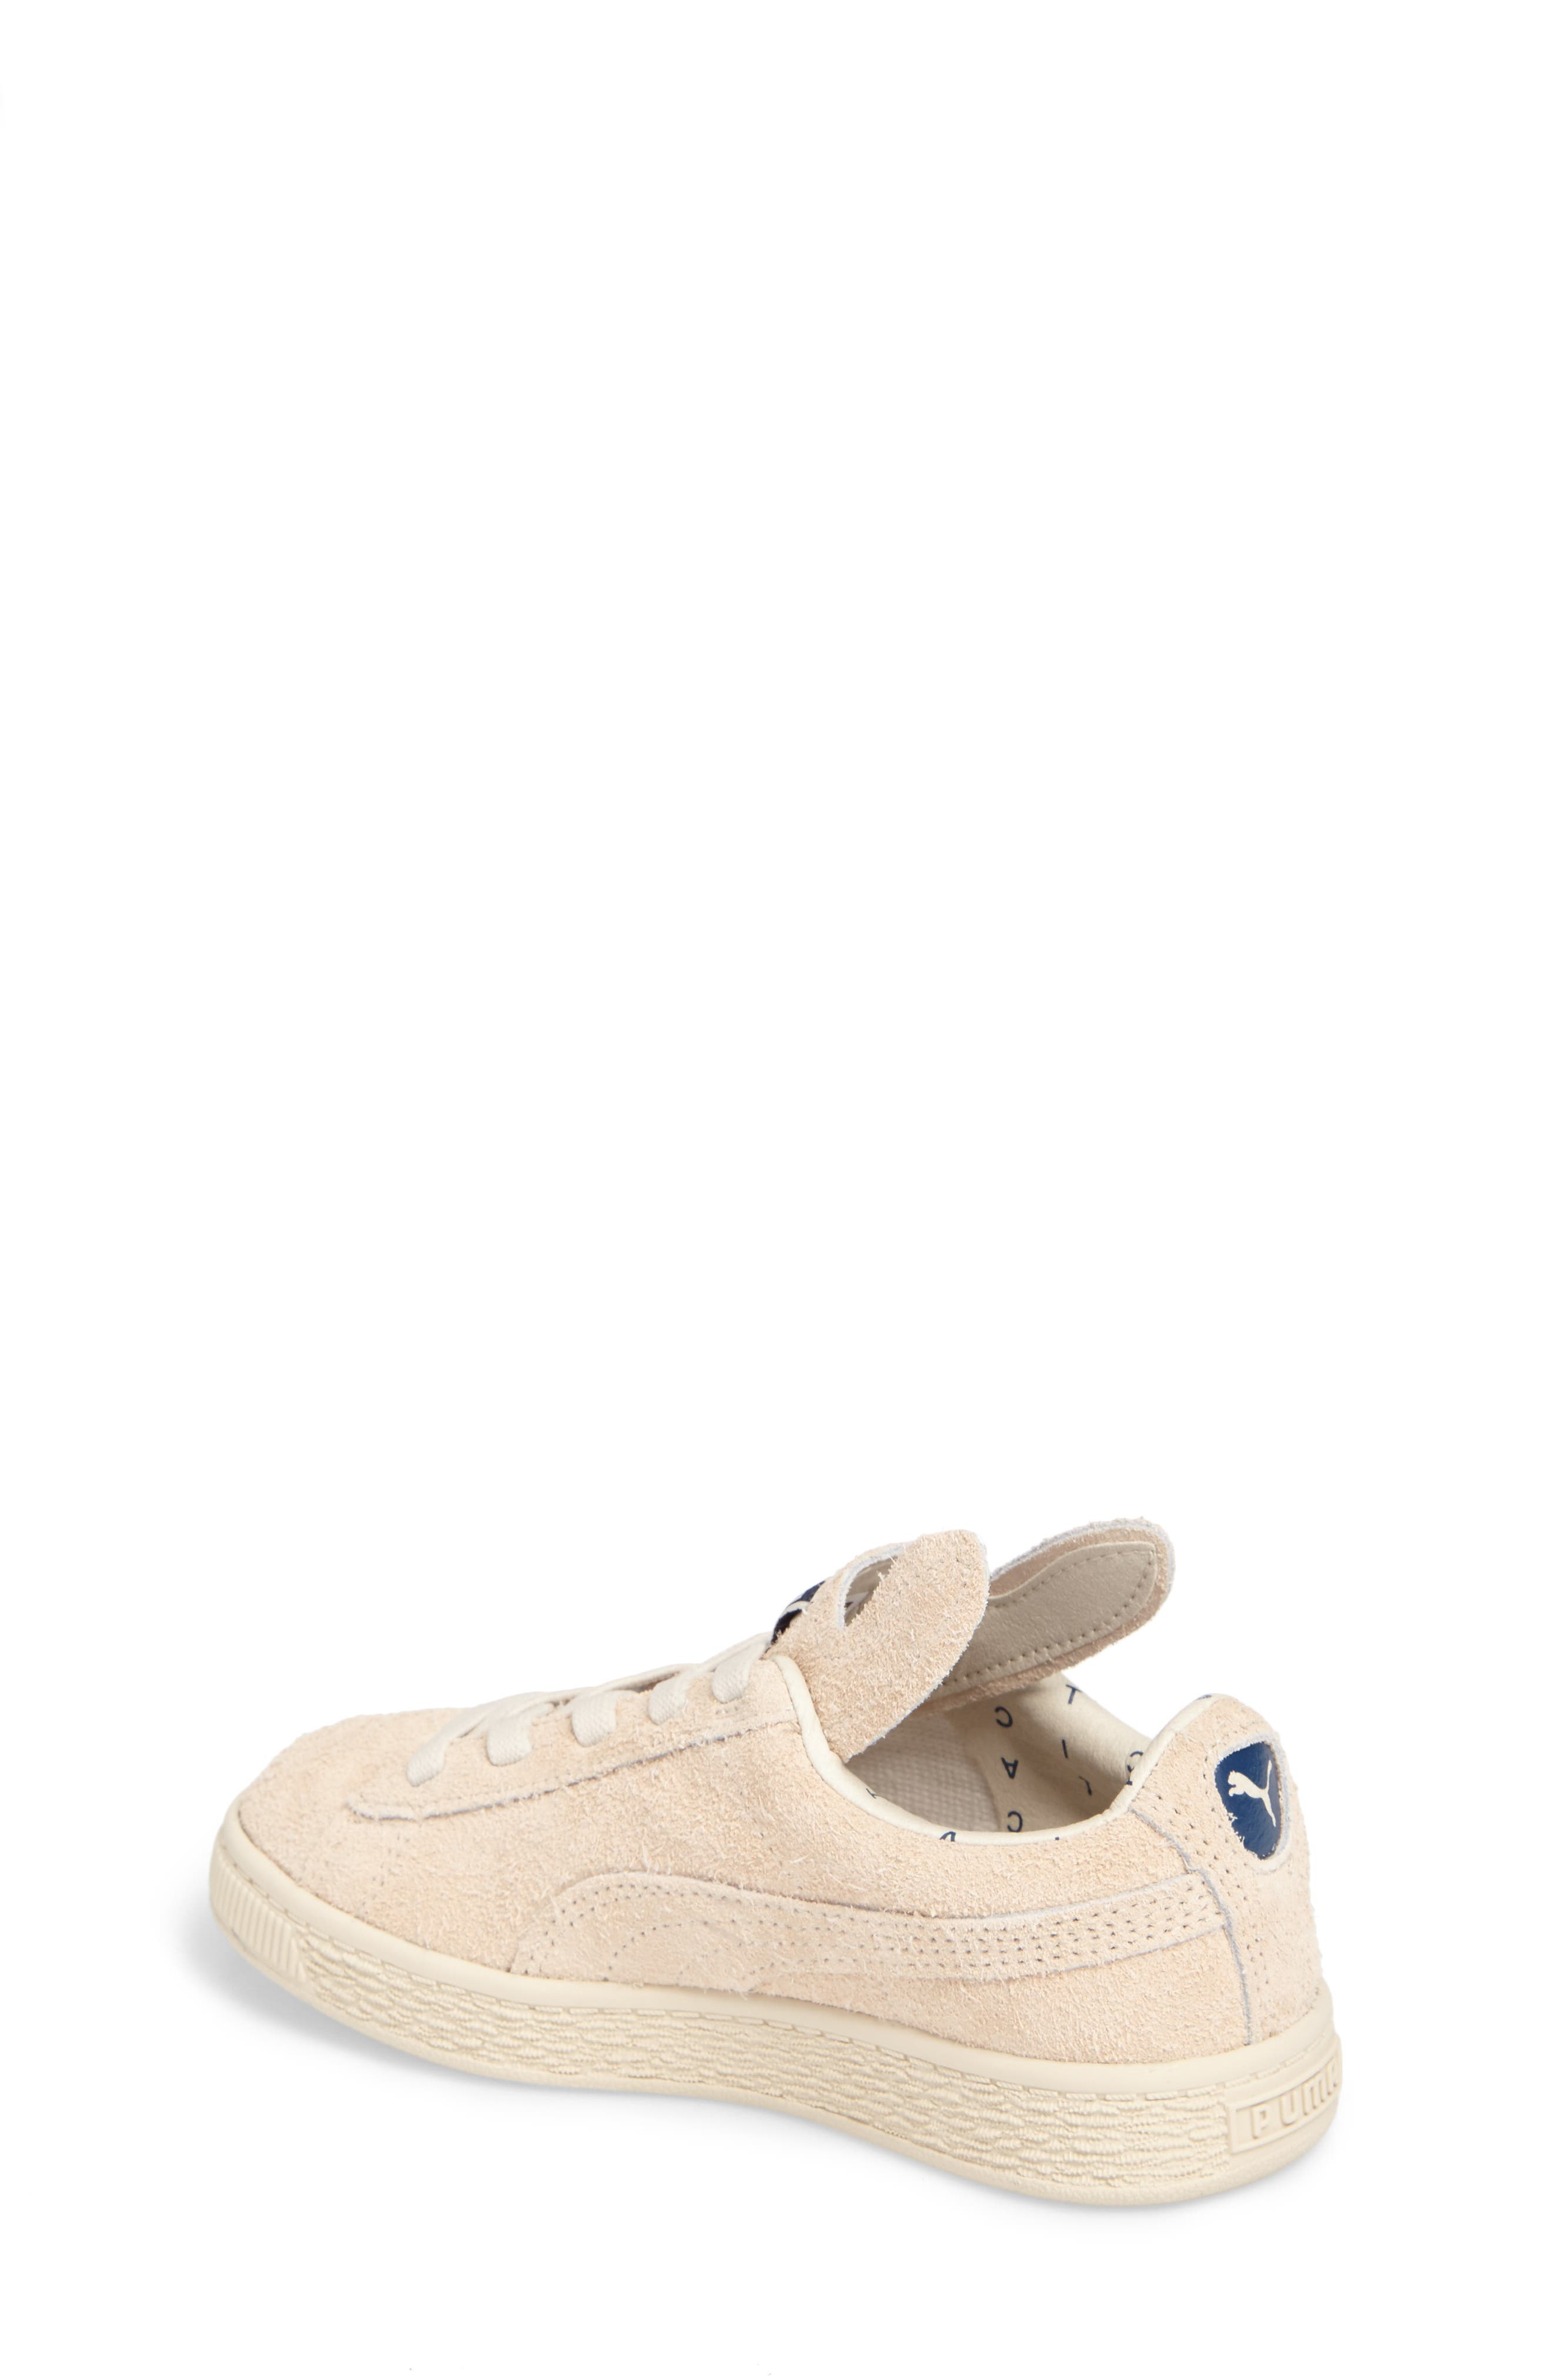 x tinycottons Basket Furry Sneaker,                             Alternate thumbnail 2, color,                             Birch/ Dress Blues